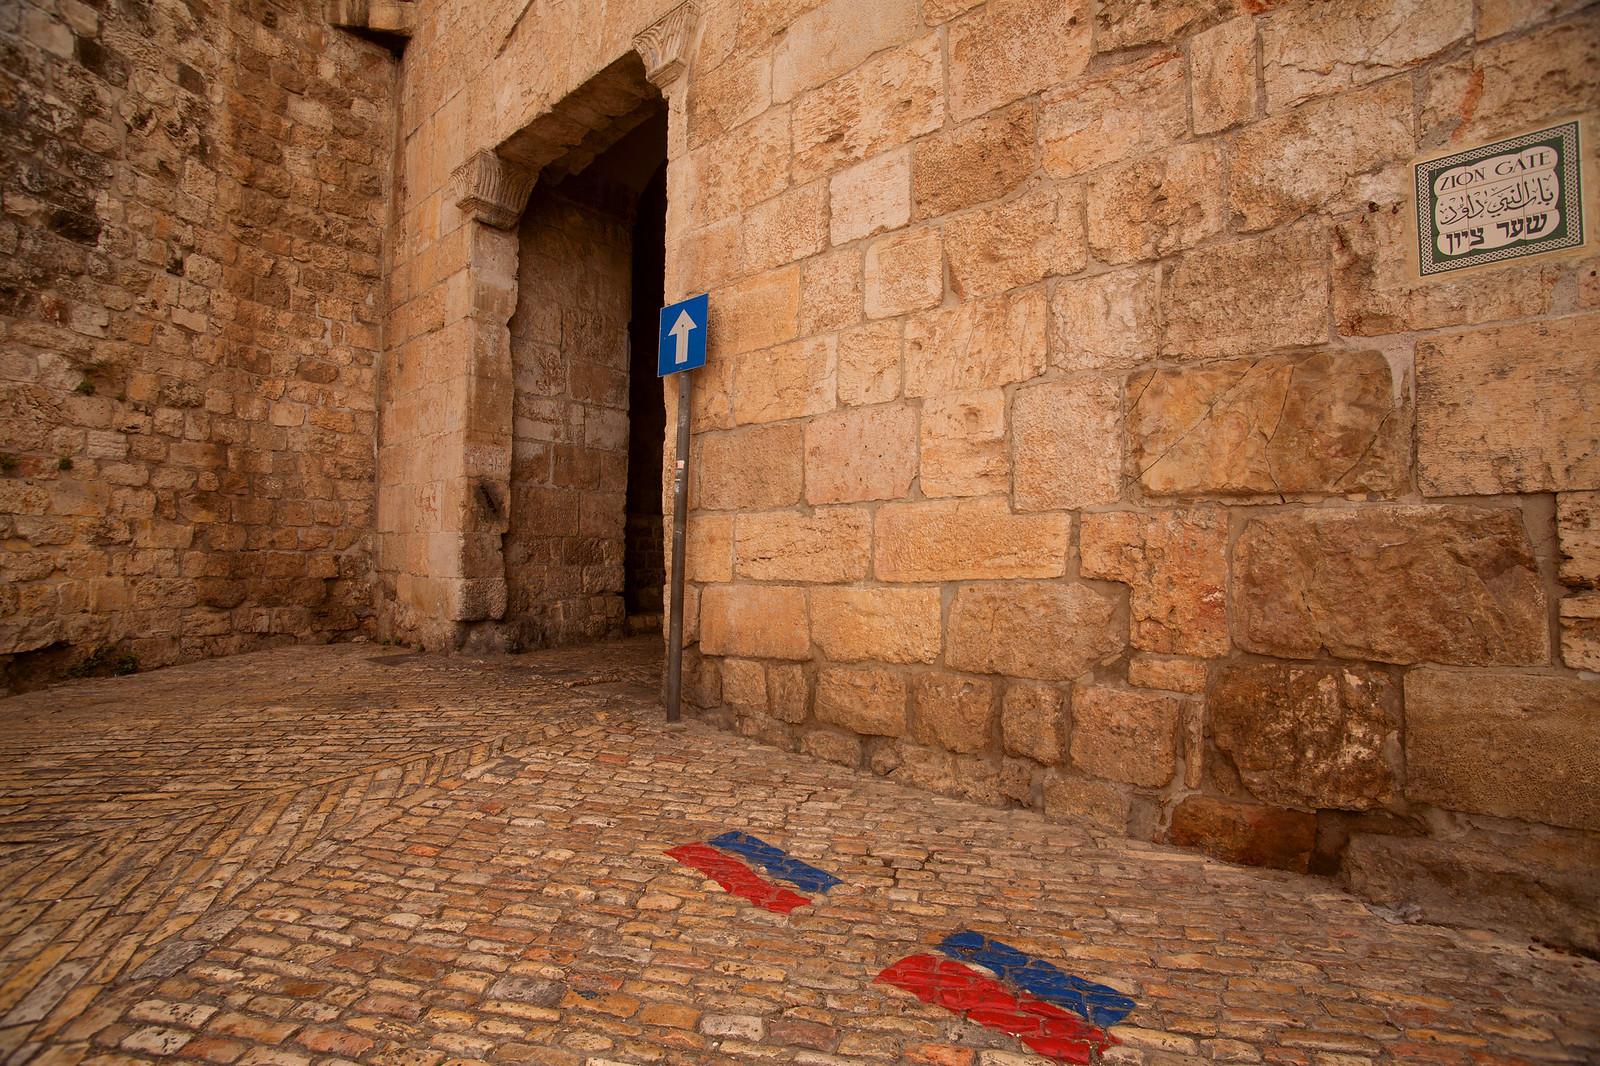 Jerusalem_Old City_Zion Gate_ Sha'ar Tzion_2_Noam Chen_IMOT